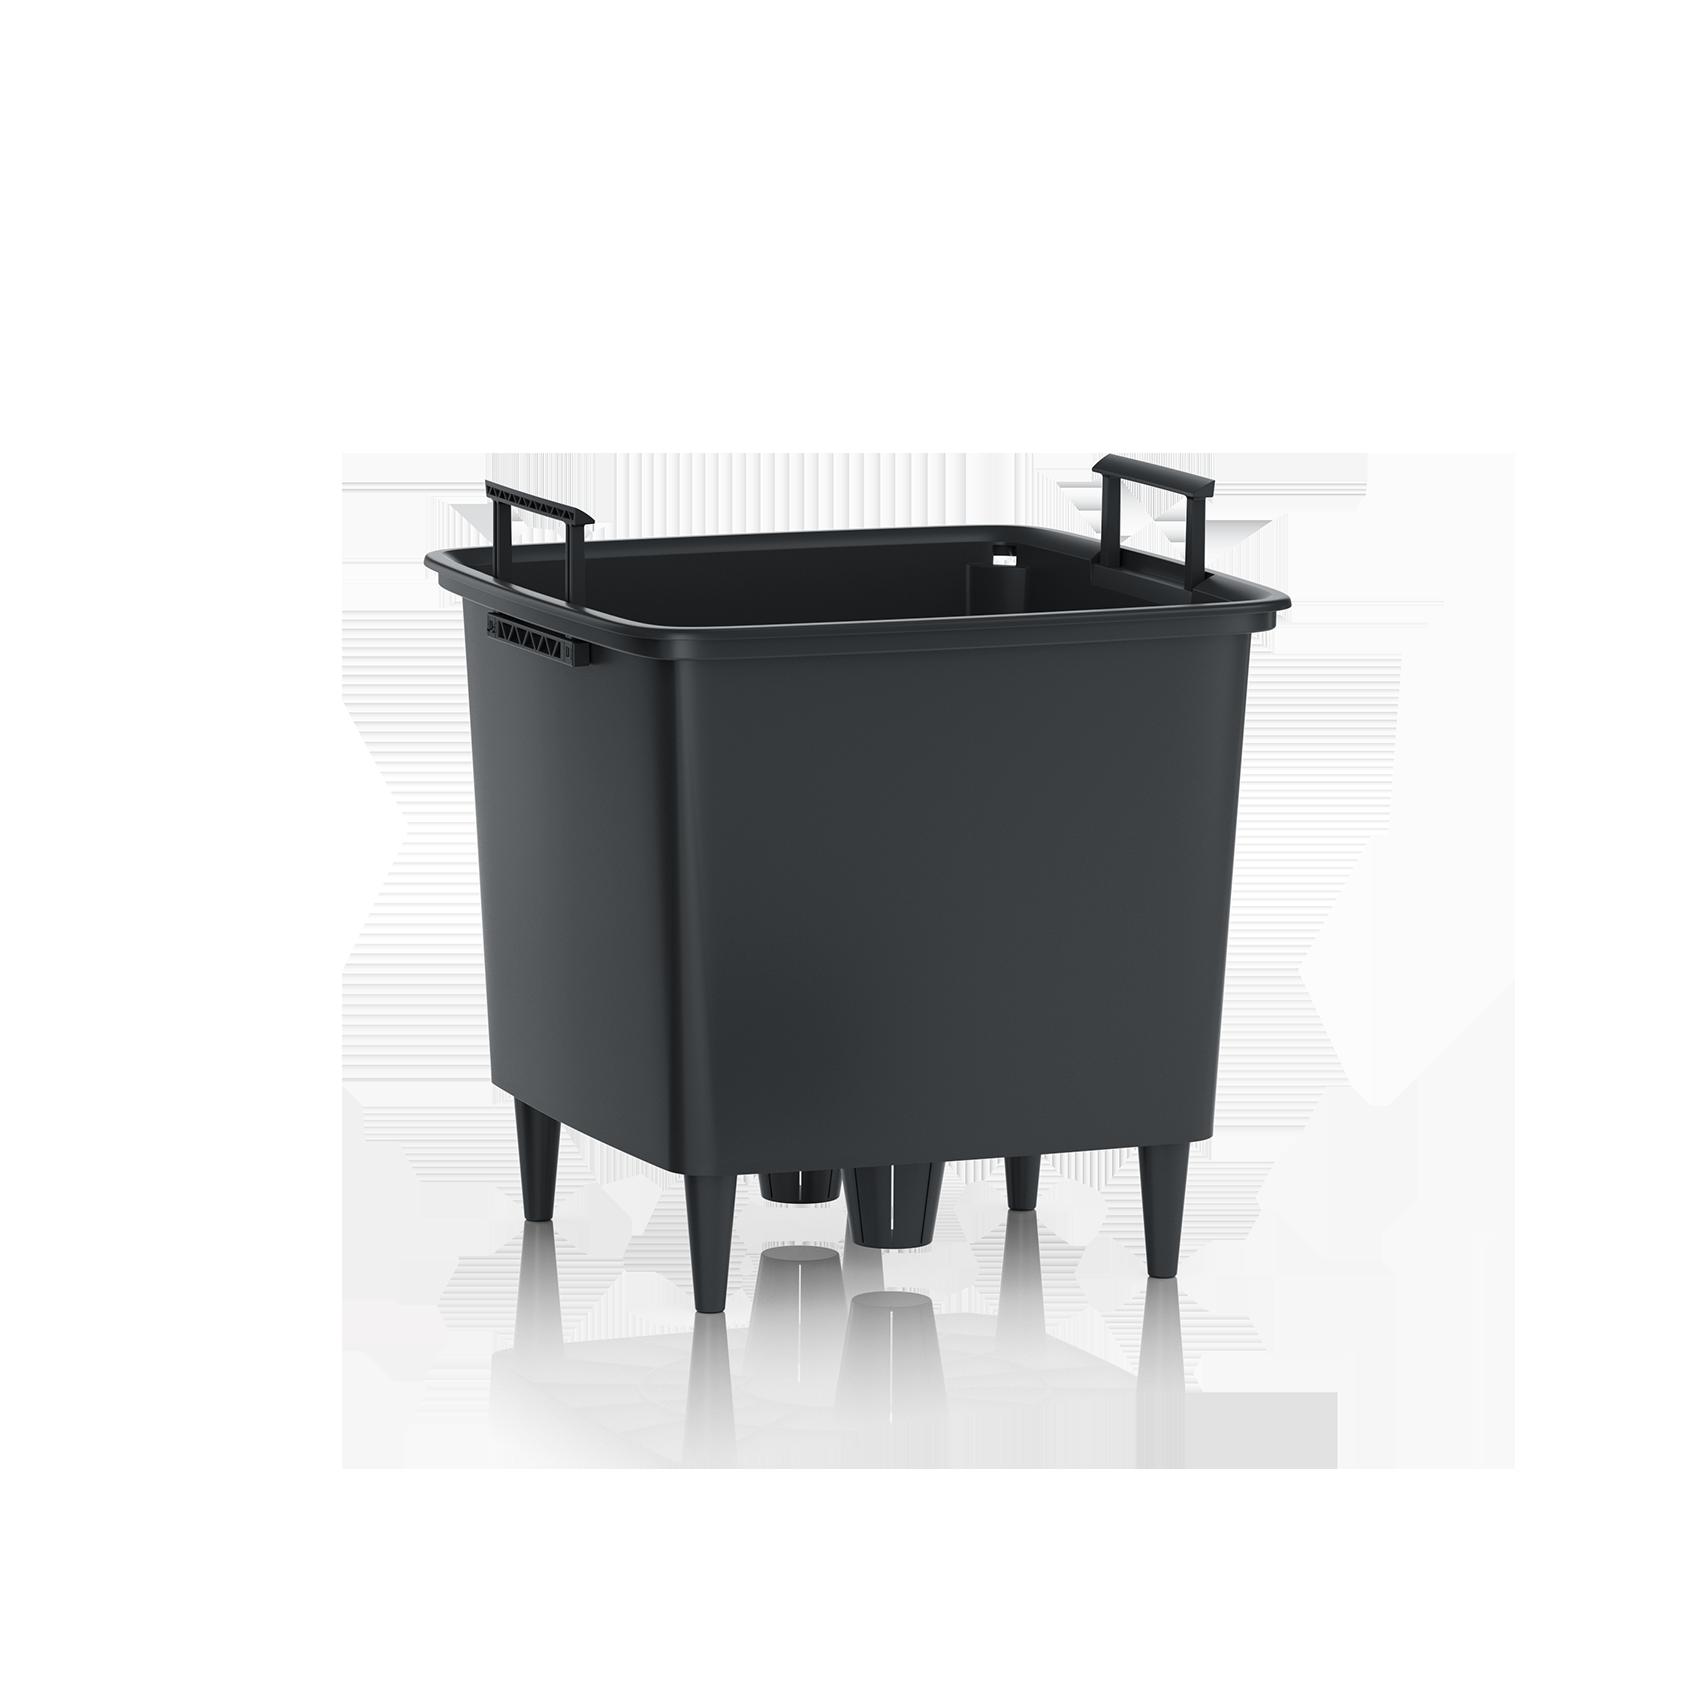 pflanzeinsatz-cube-ls-color_product_listingimage